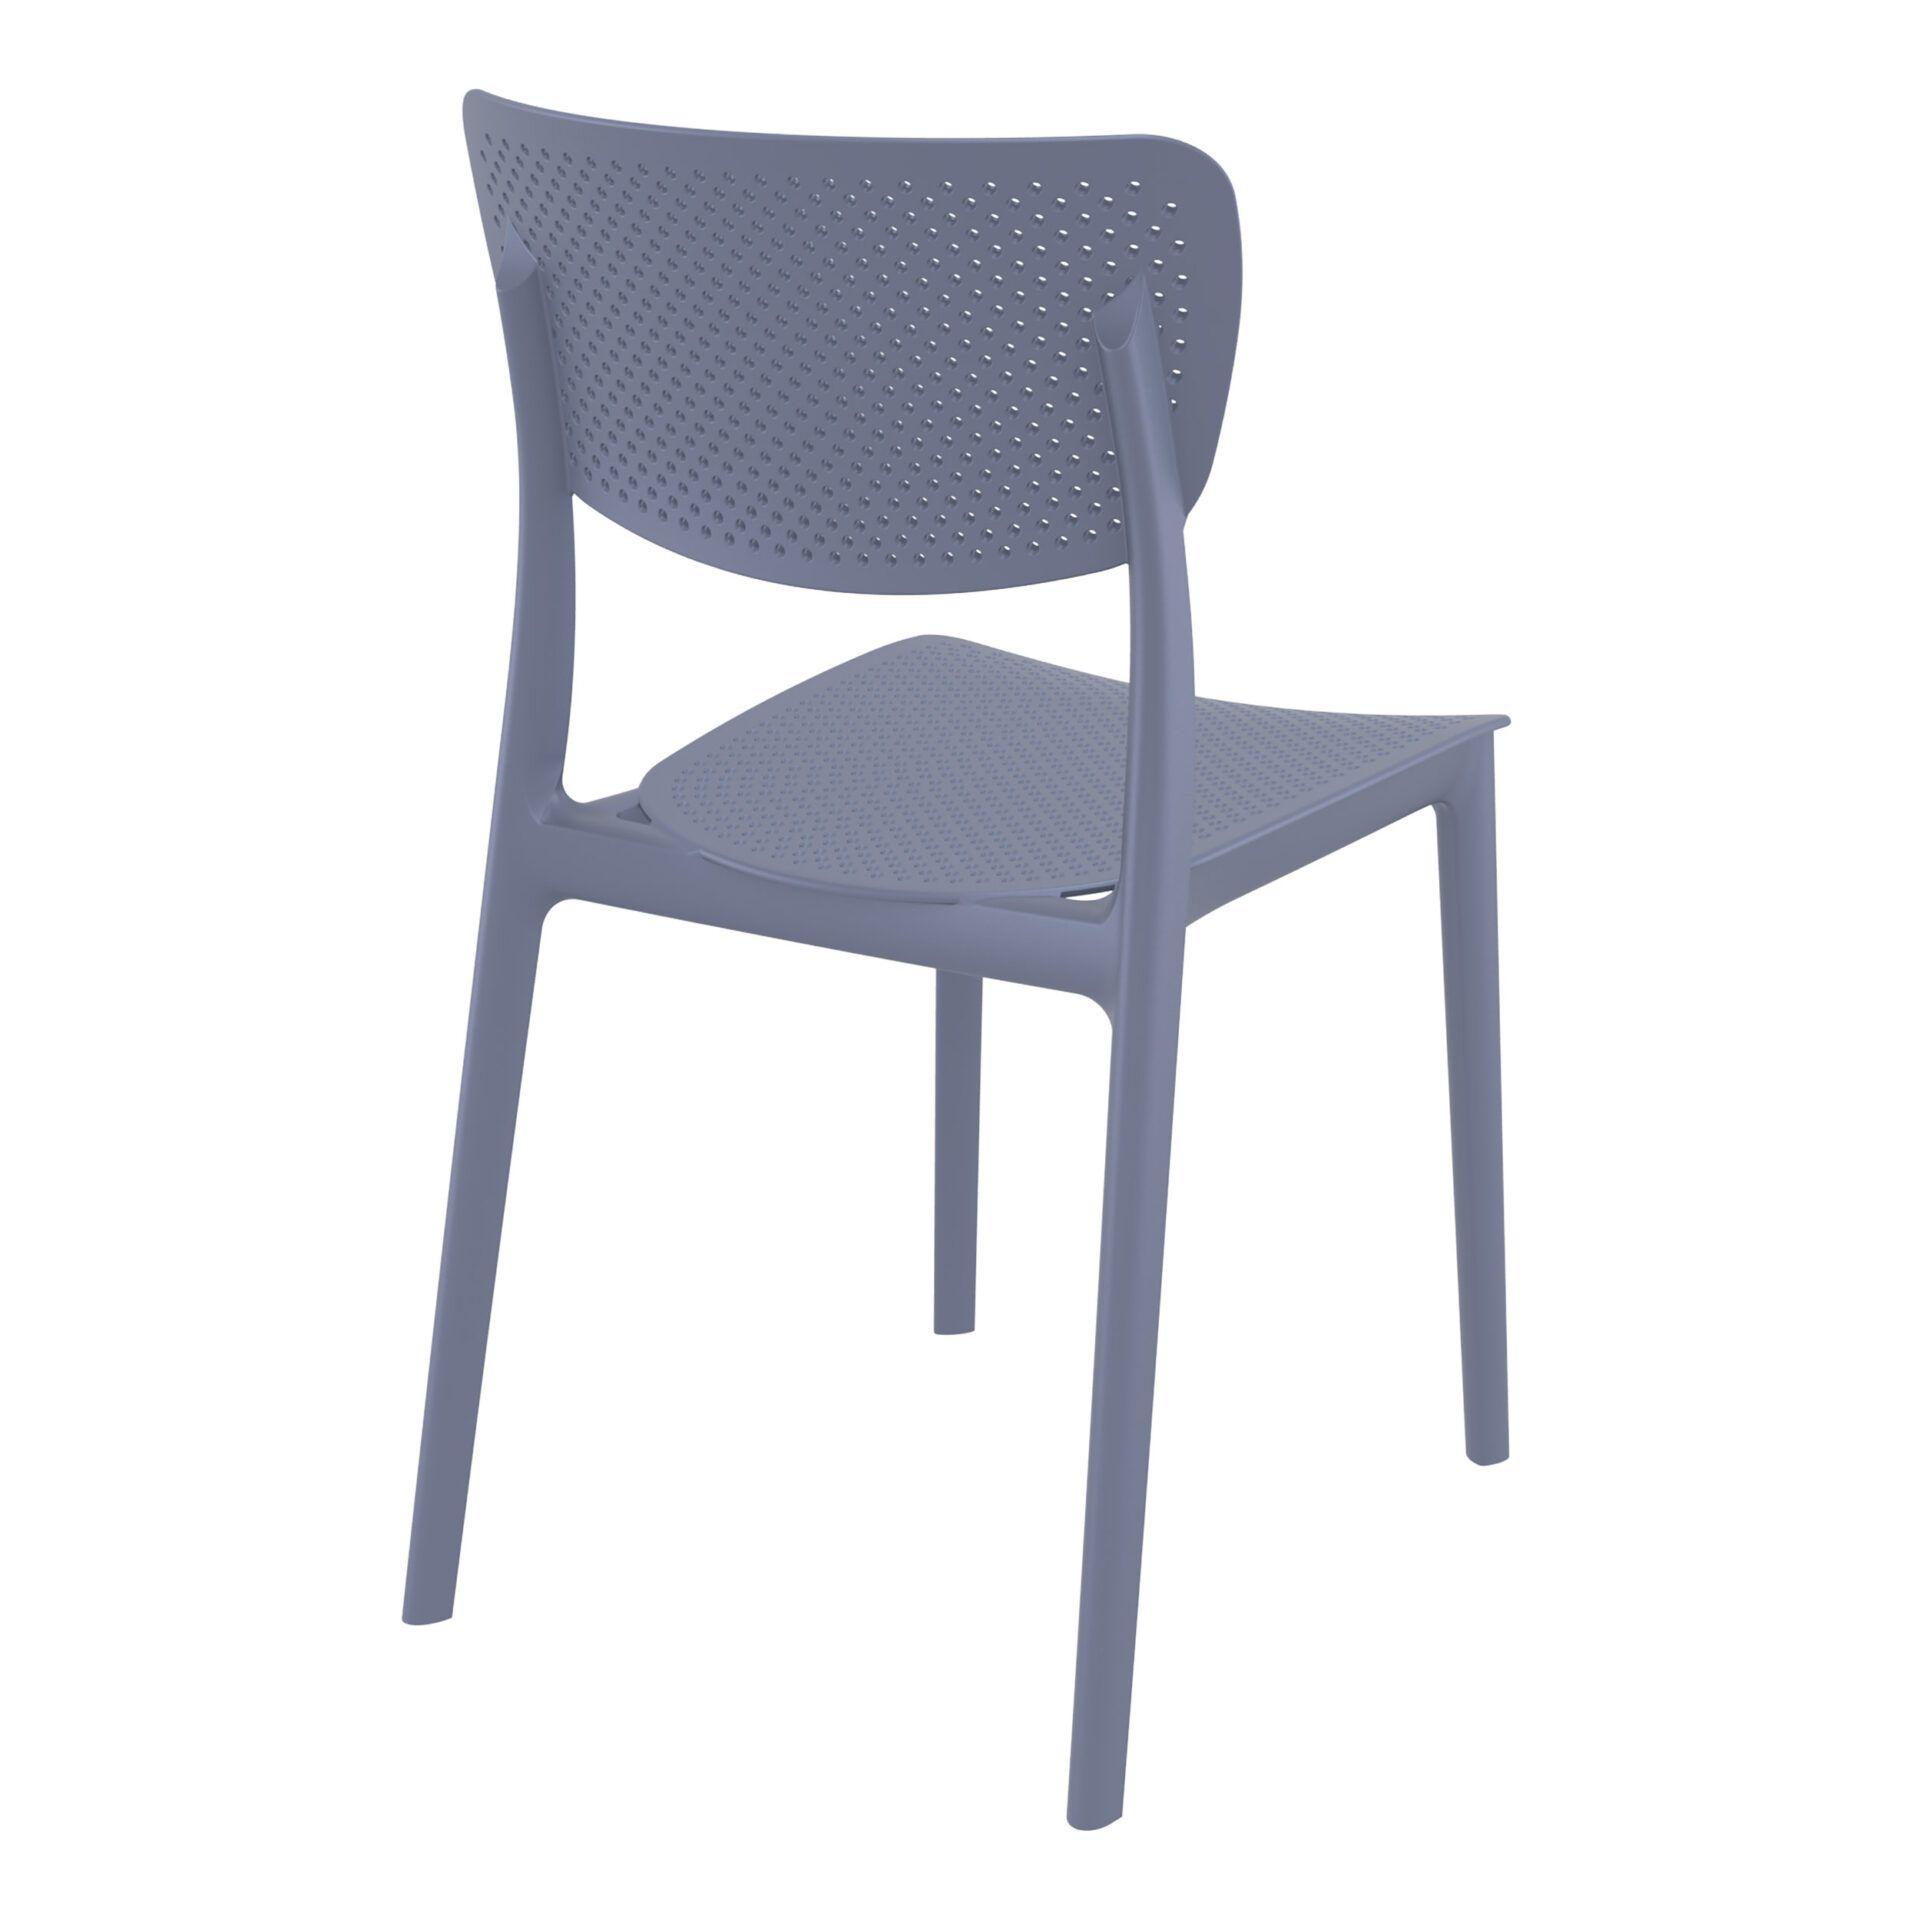 polypropylene hospitality seating lucy chair darkgrey back side